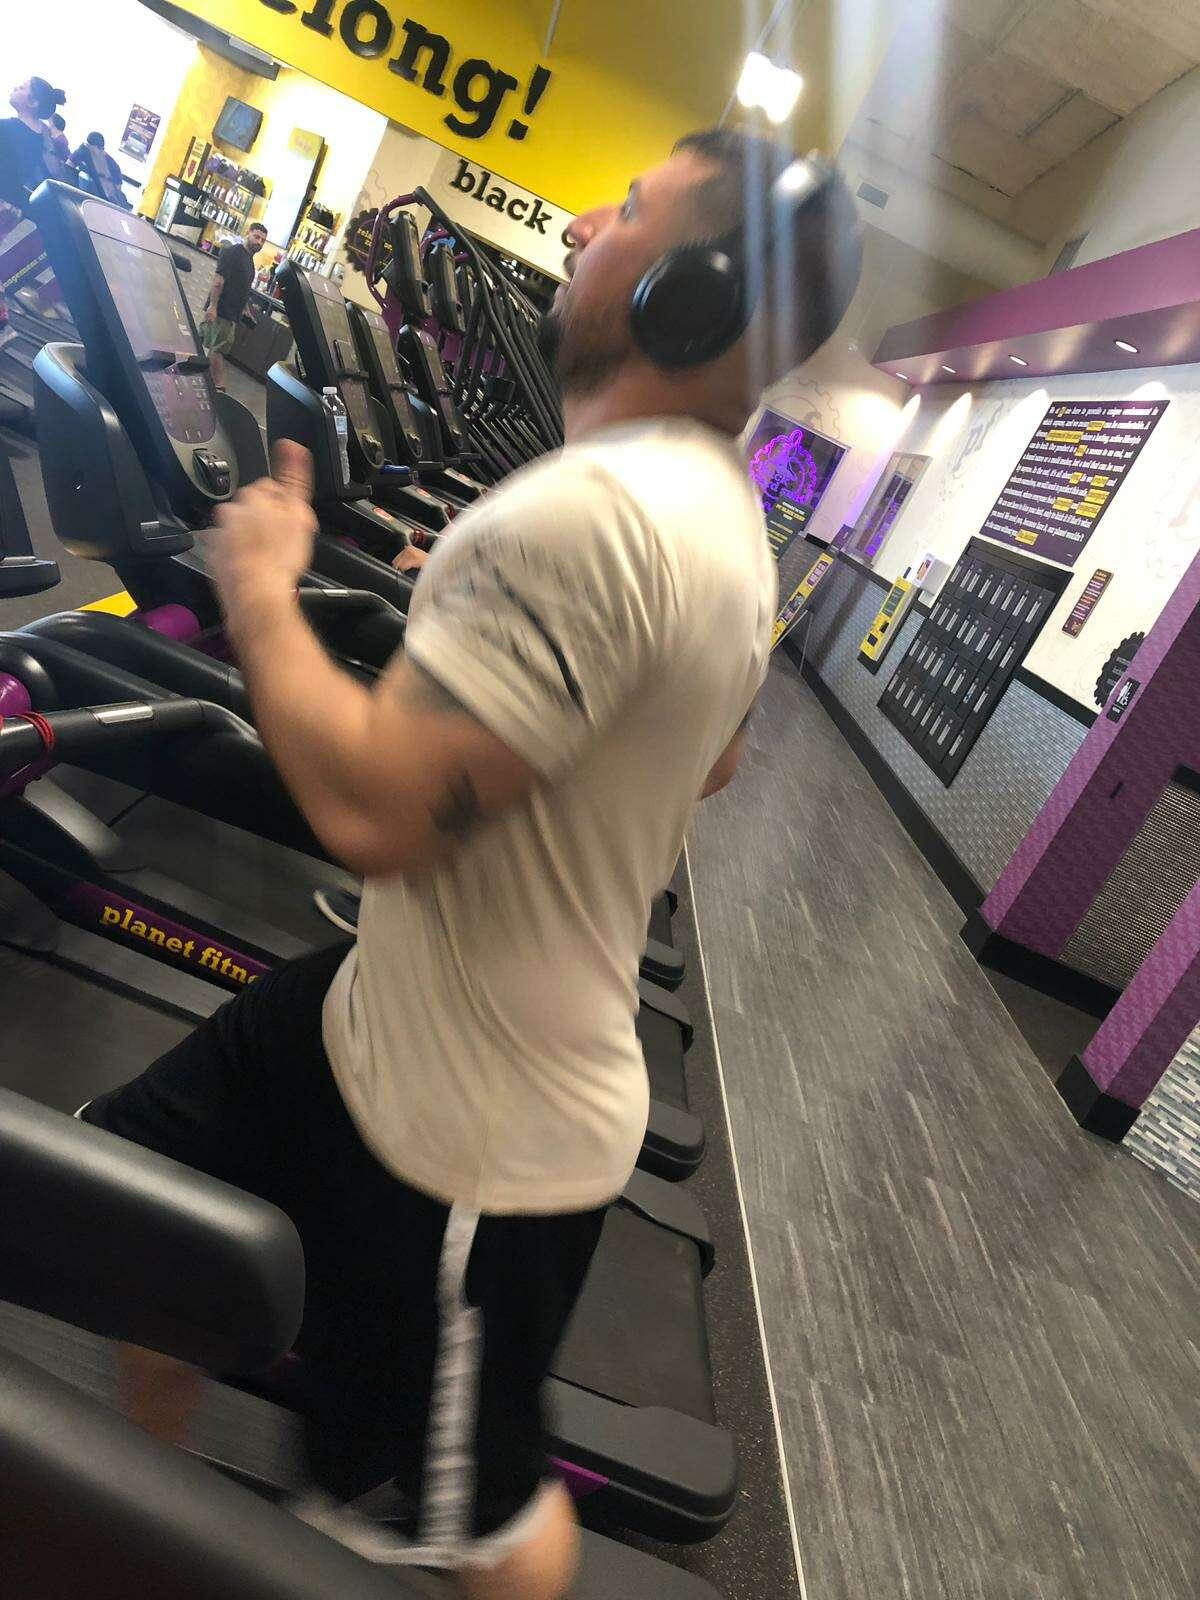 Jonathan Zapata at Planet Fitness